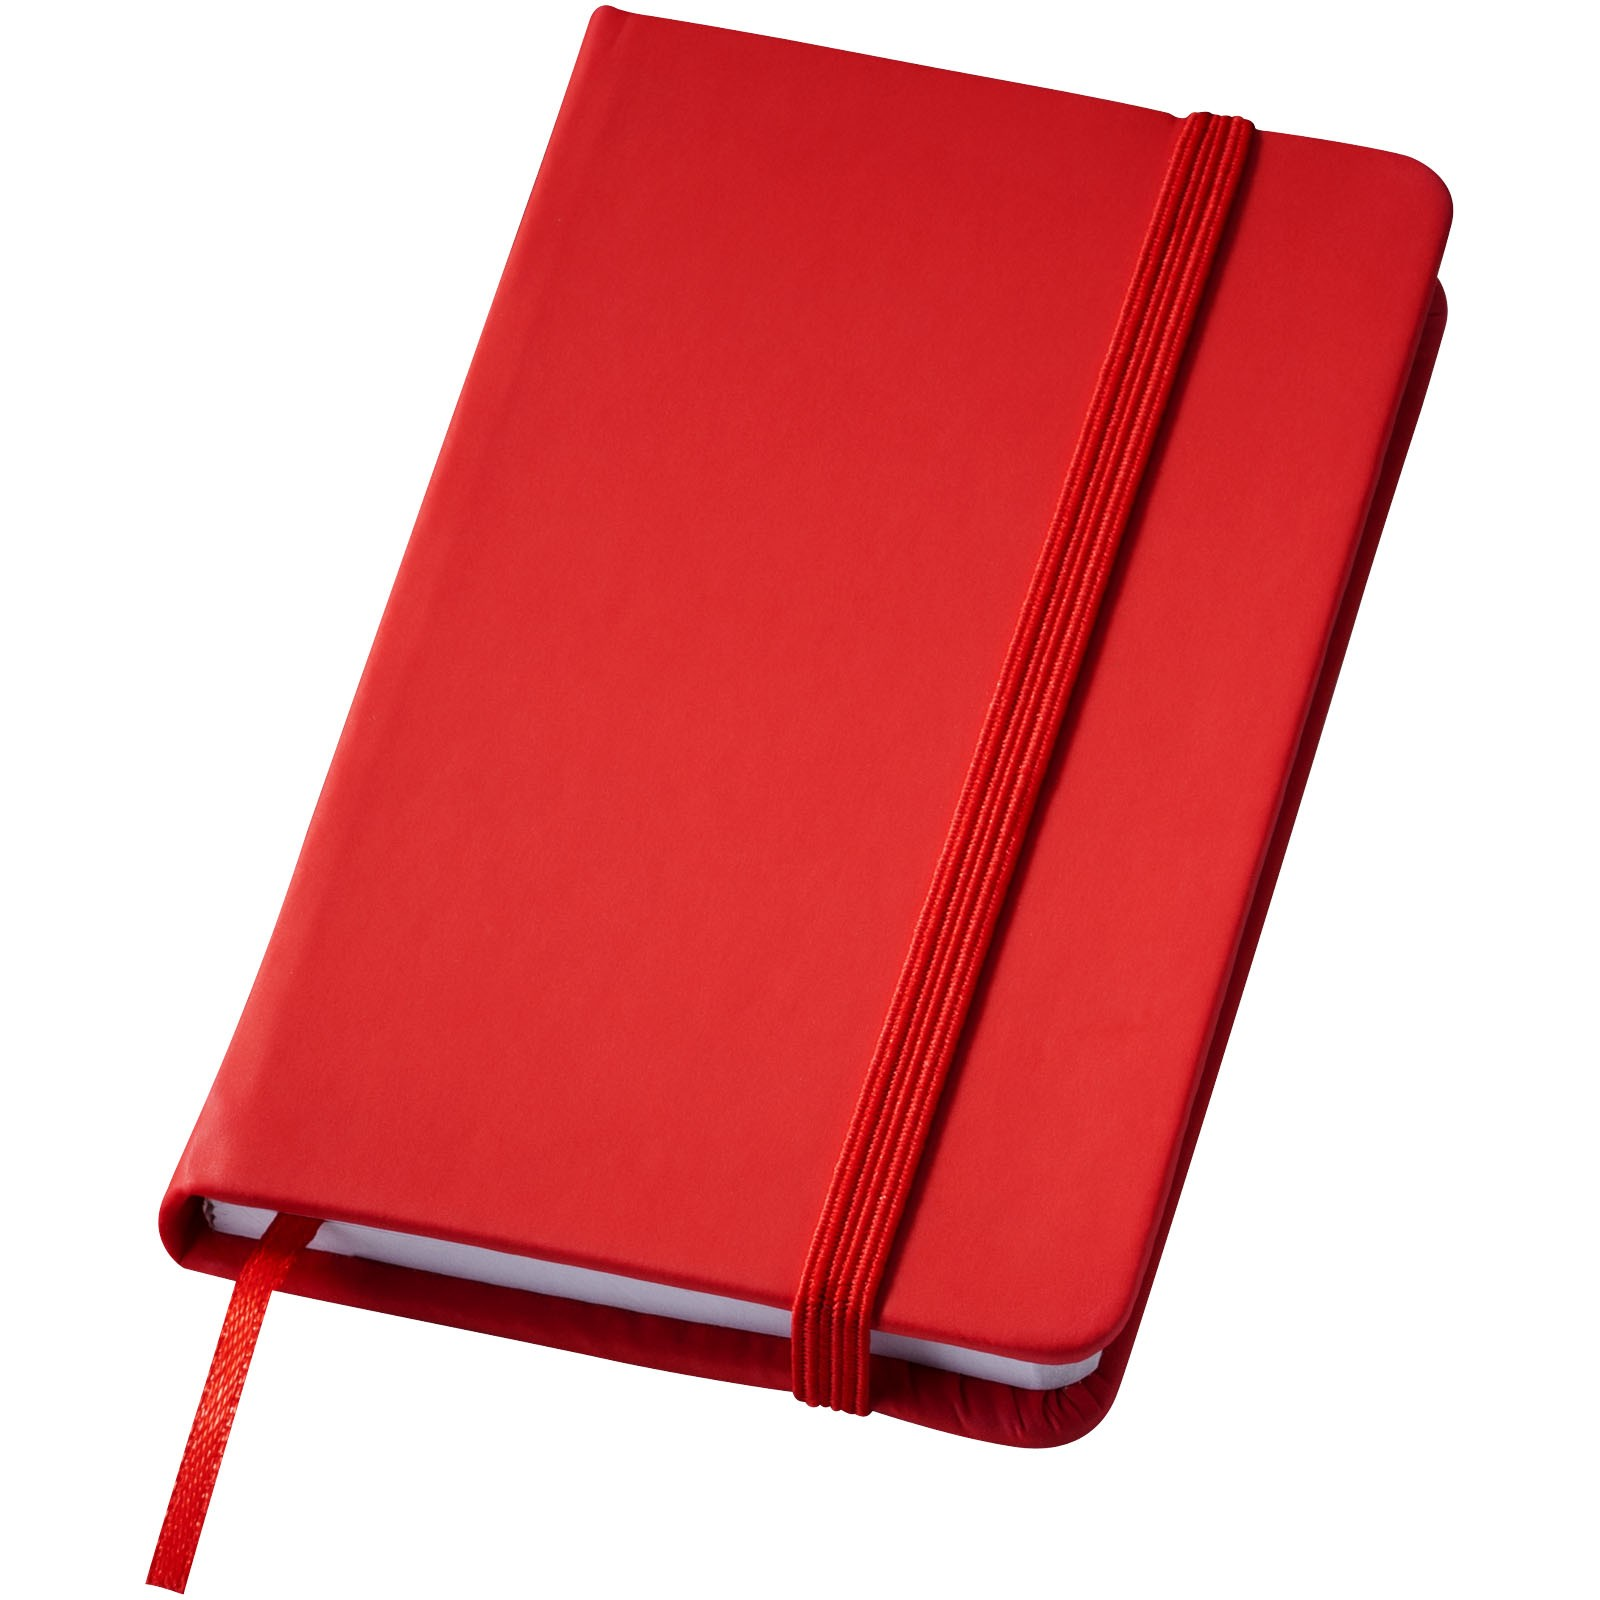 Rainbow A7 kleines Hard Cover Notizbuch - Rot